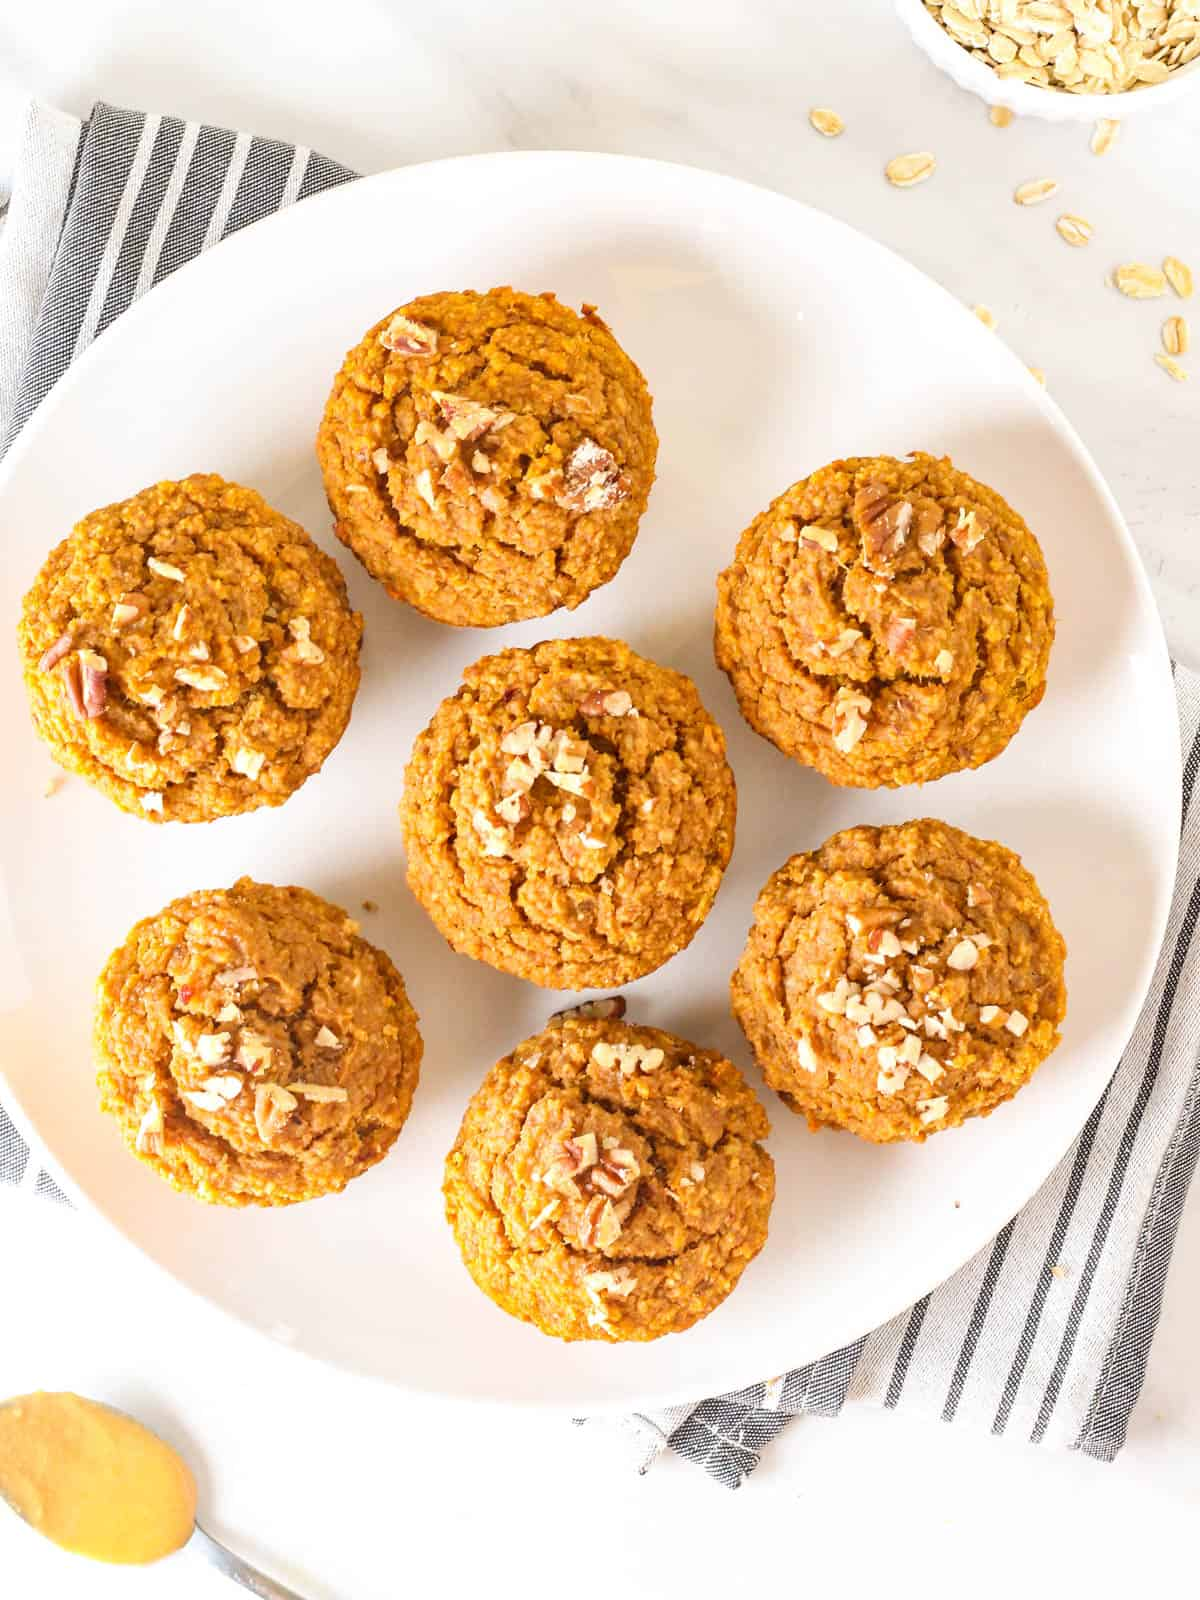 Sweet potato oatmeal muffins on a plate.